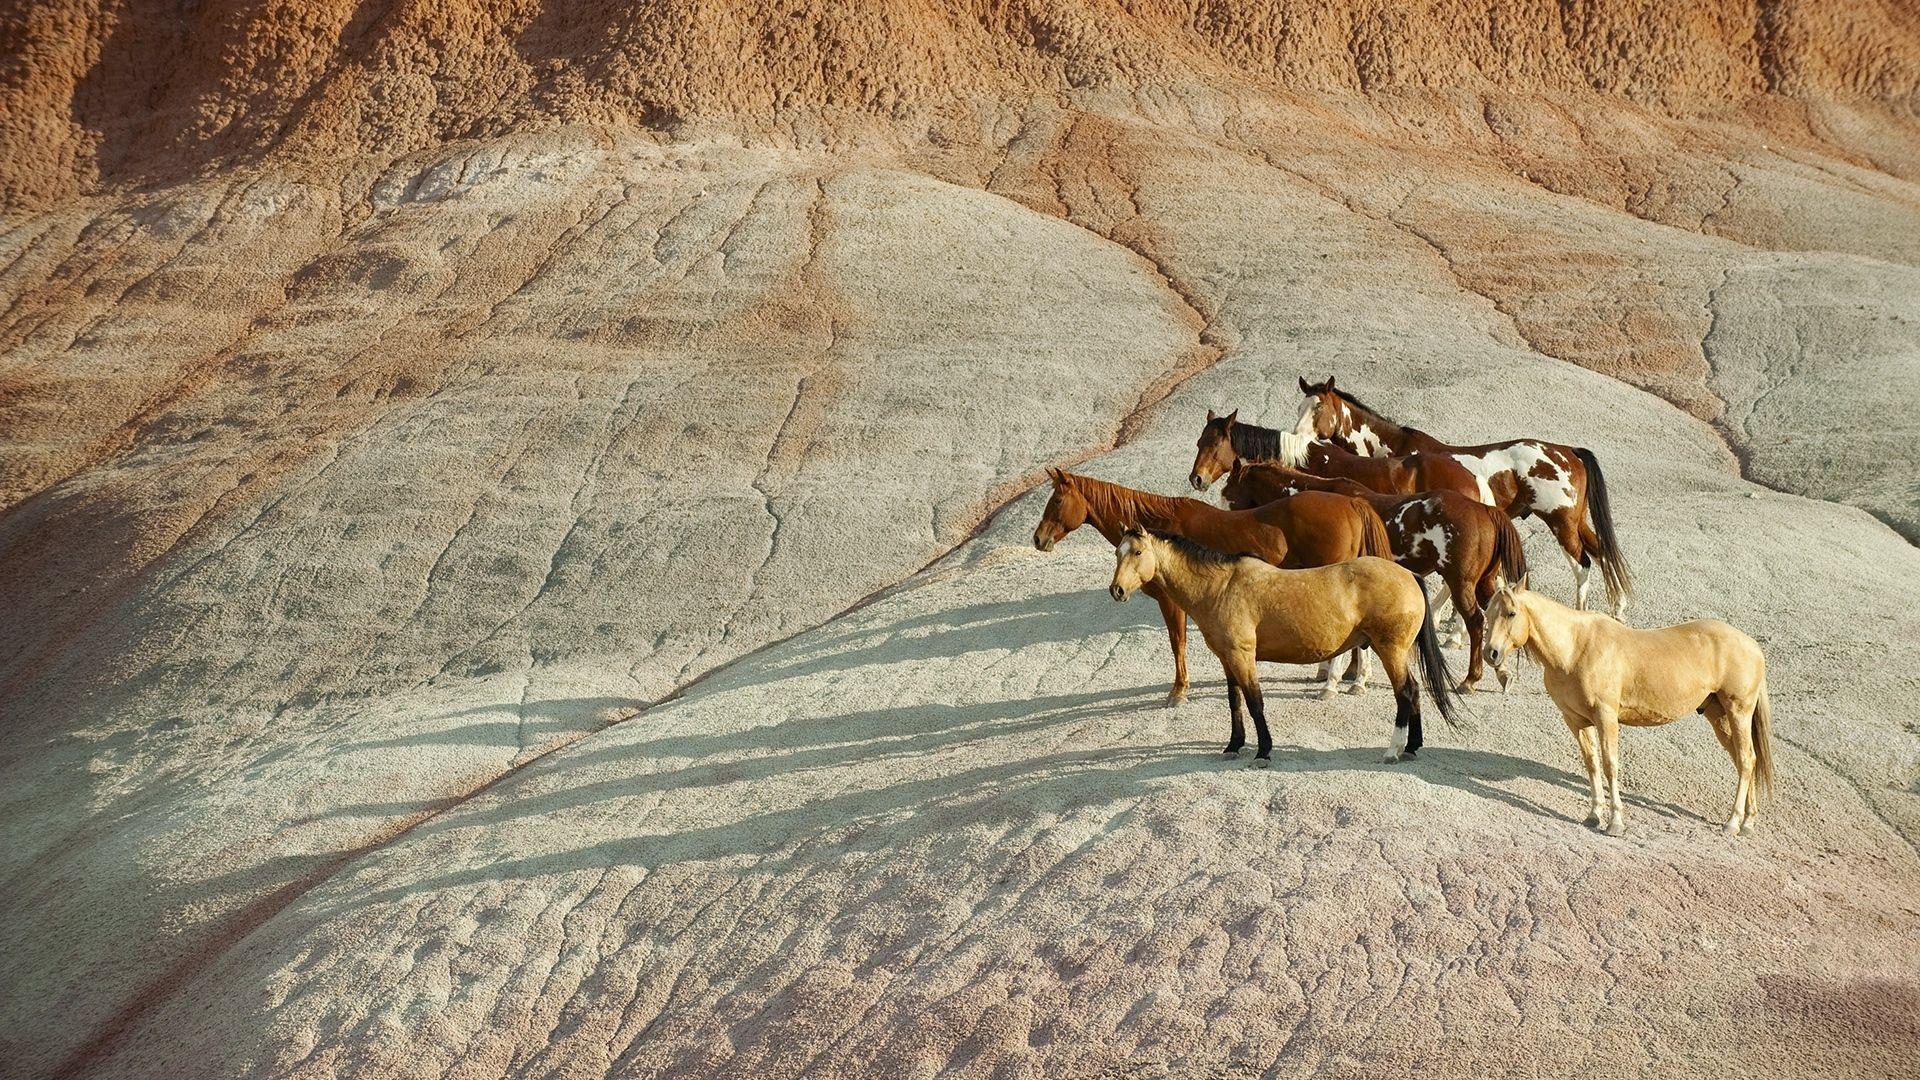 Beautiful Wallpaper Horse Sunrise - 118463d61c69d44fffec4e8053eebfcd  Pic_834065.jpg